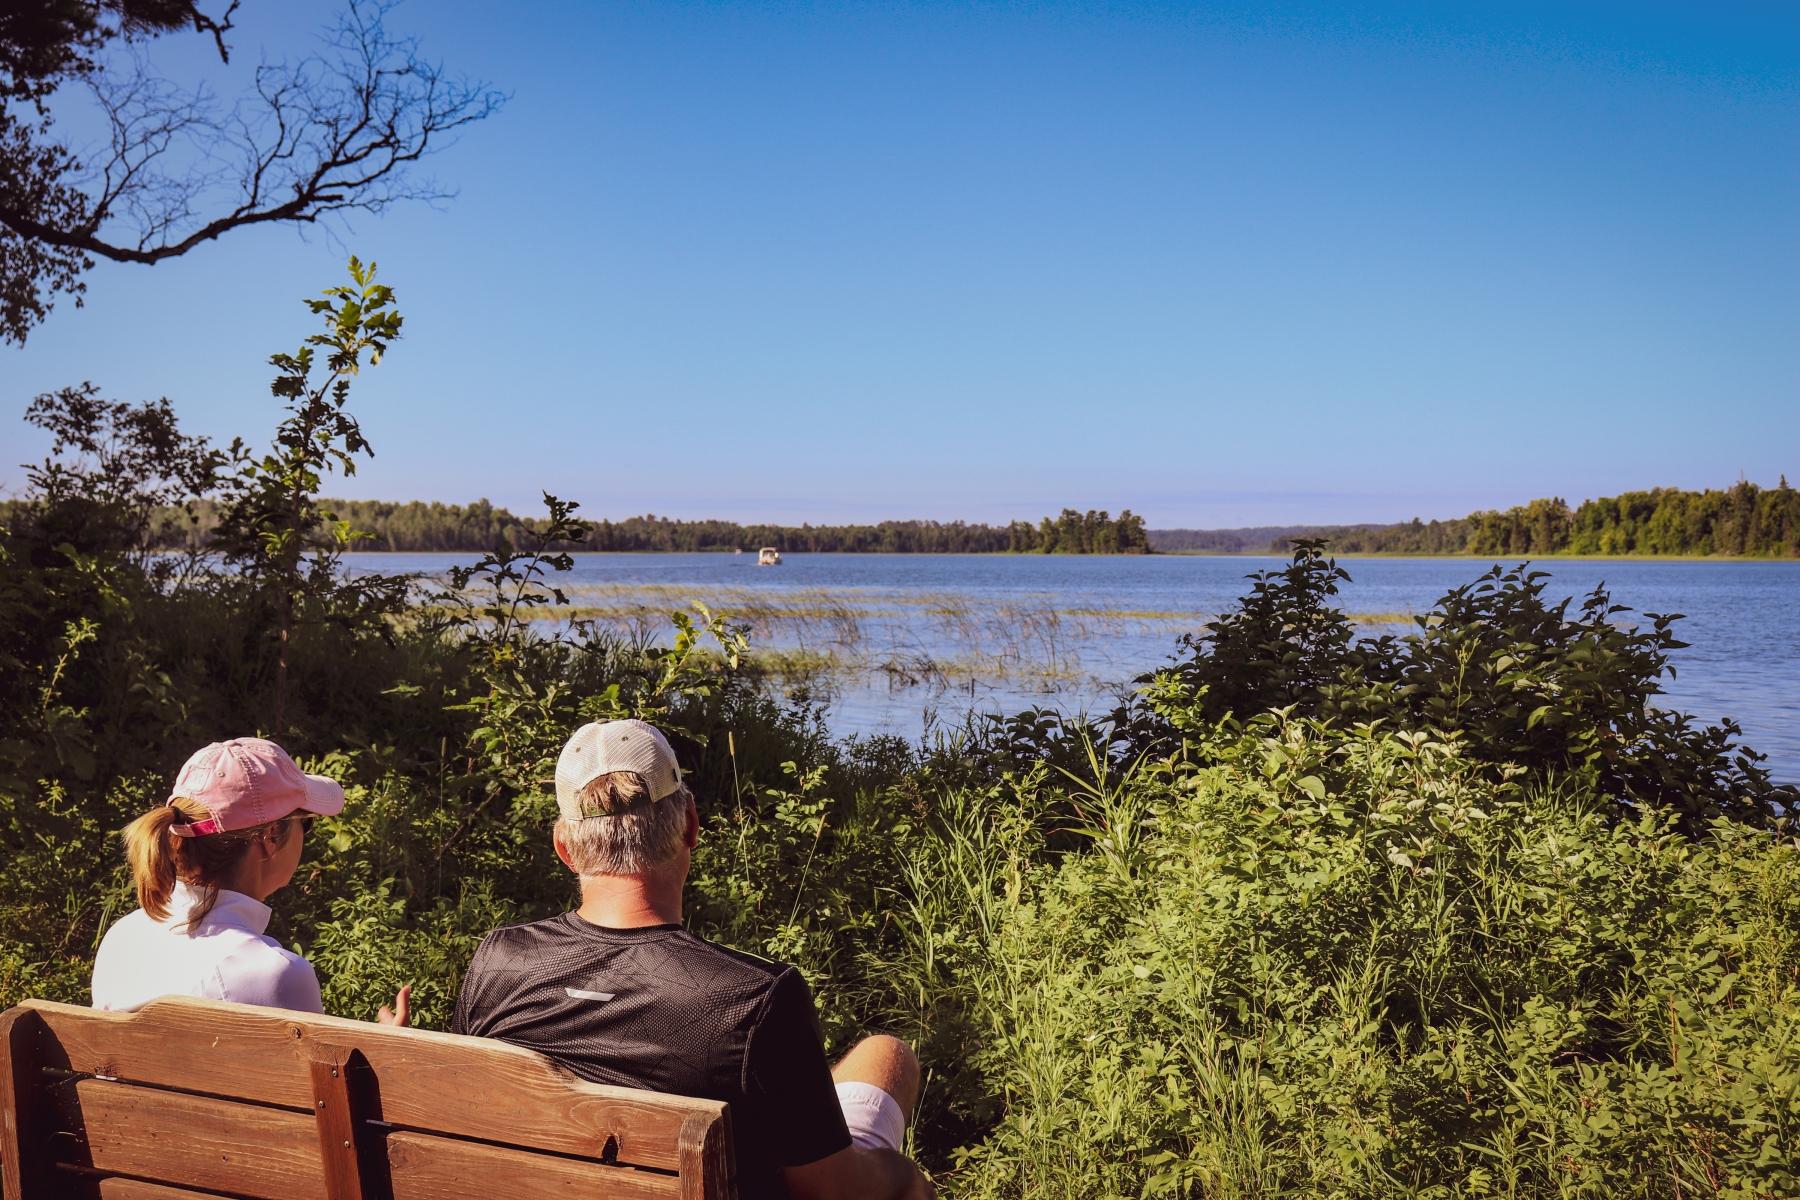 Lakeside Rest